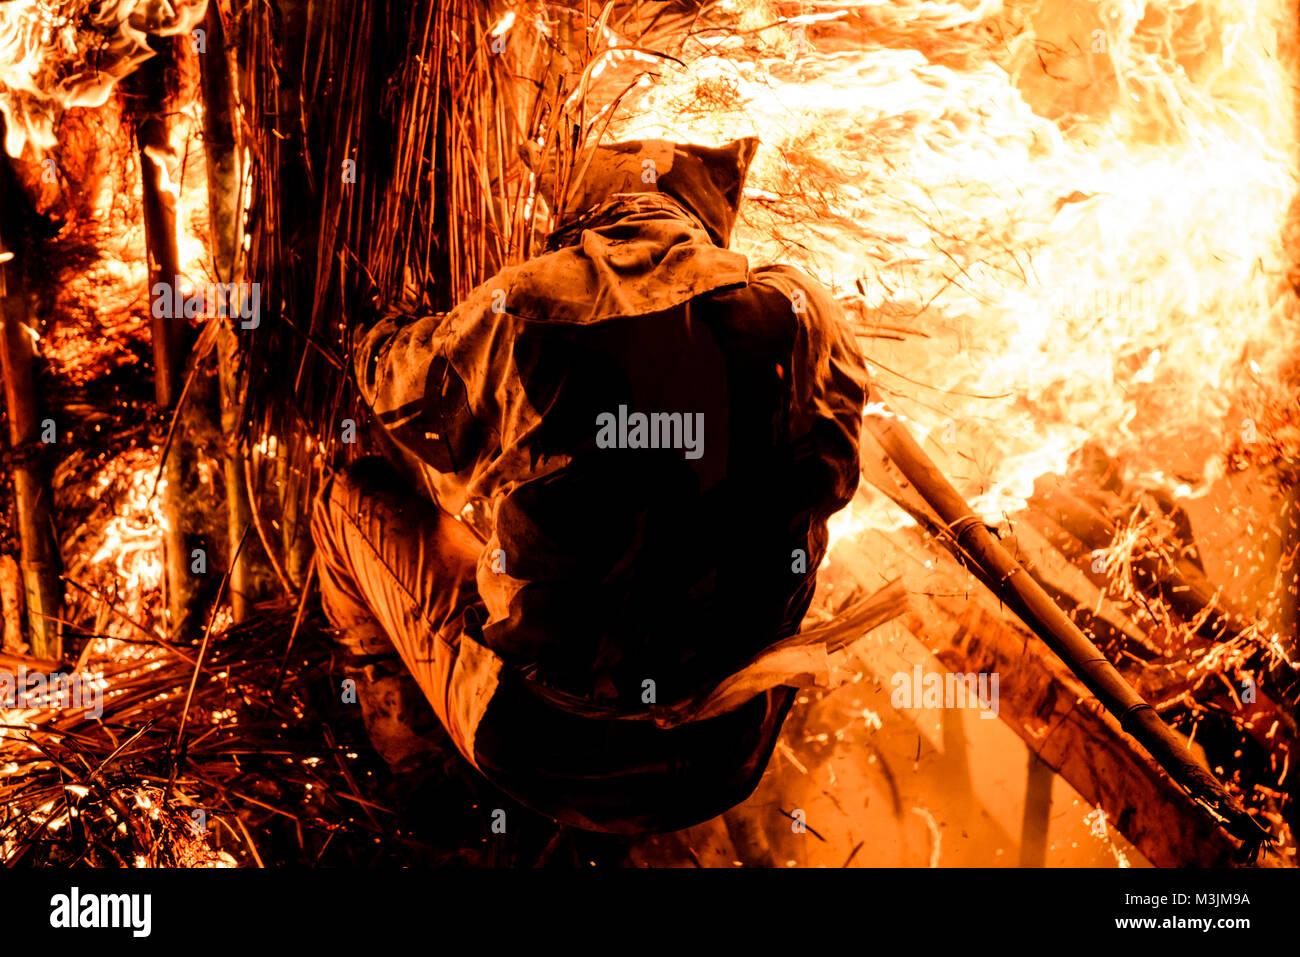 Nishio, Japan. 11th Feb, 2018. Men attempt to pull apart burning torches during Toba-no-Hi-matsuri, a fire festival - Stock Image